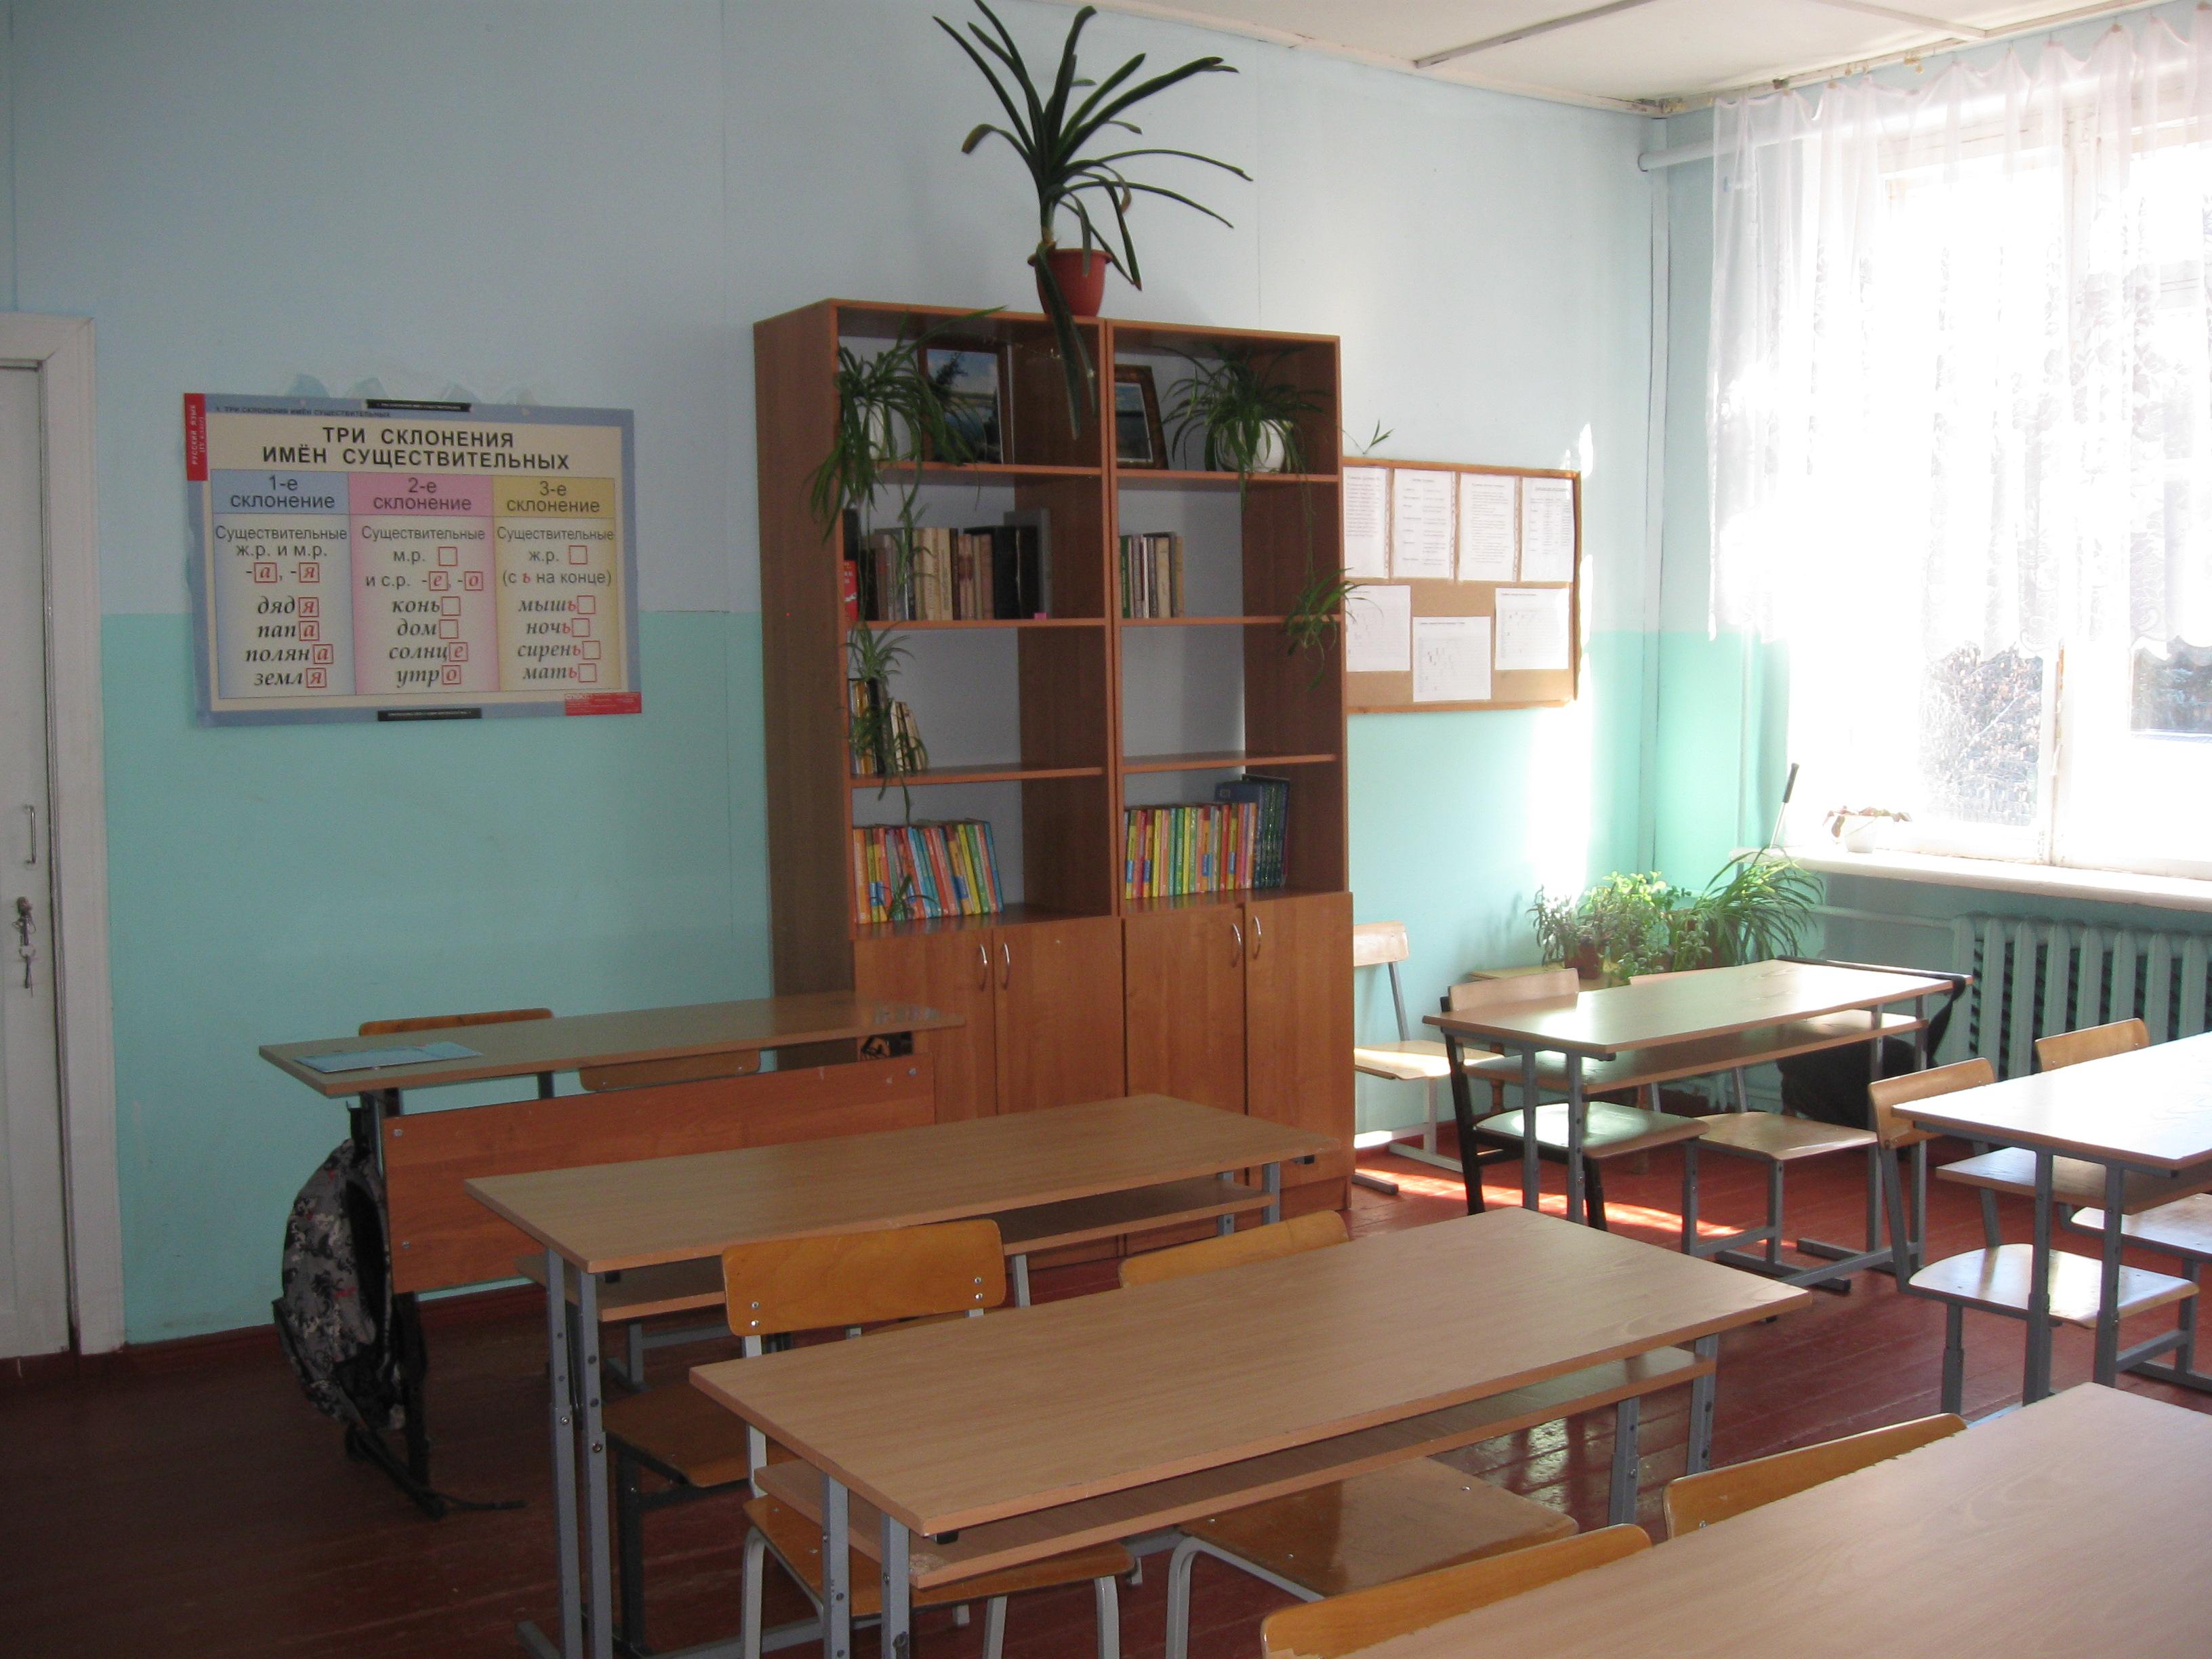 http://img-fotki.yandex.ru/get/5102/198507022.3/0_10b40d_f00c3b58_orig